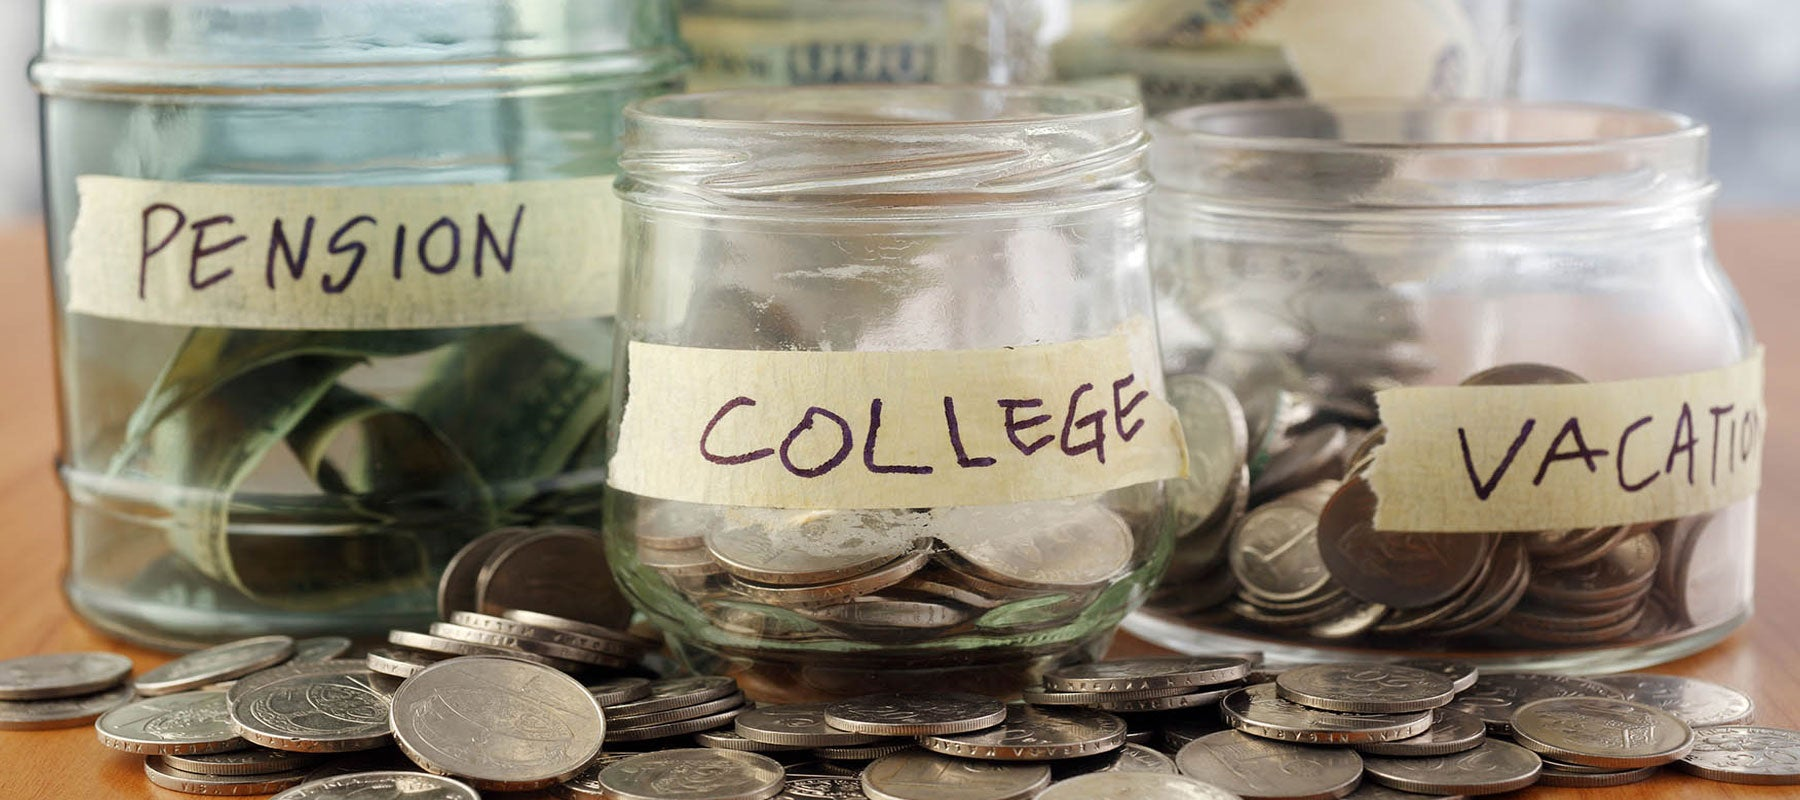 Money jars-savings-college